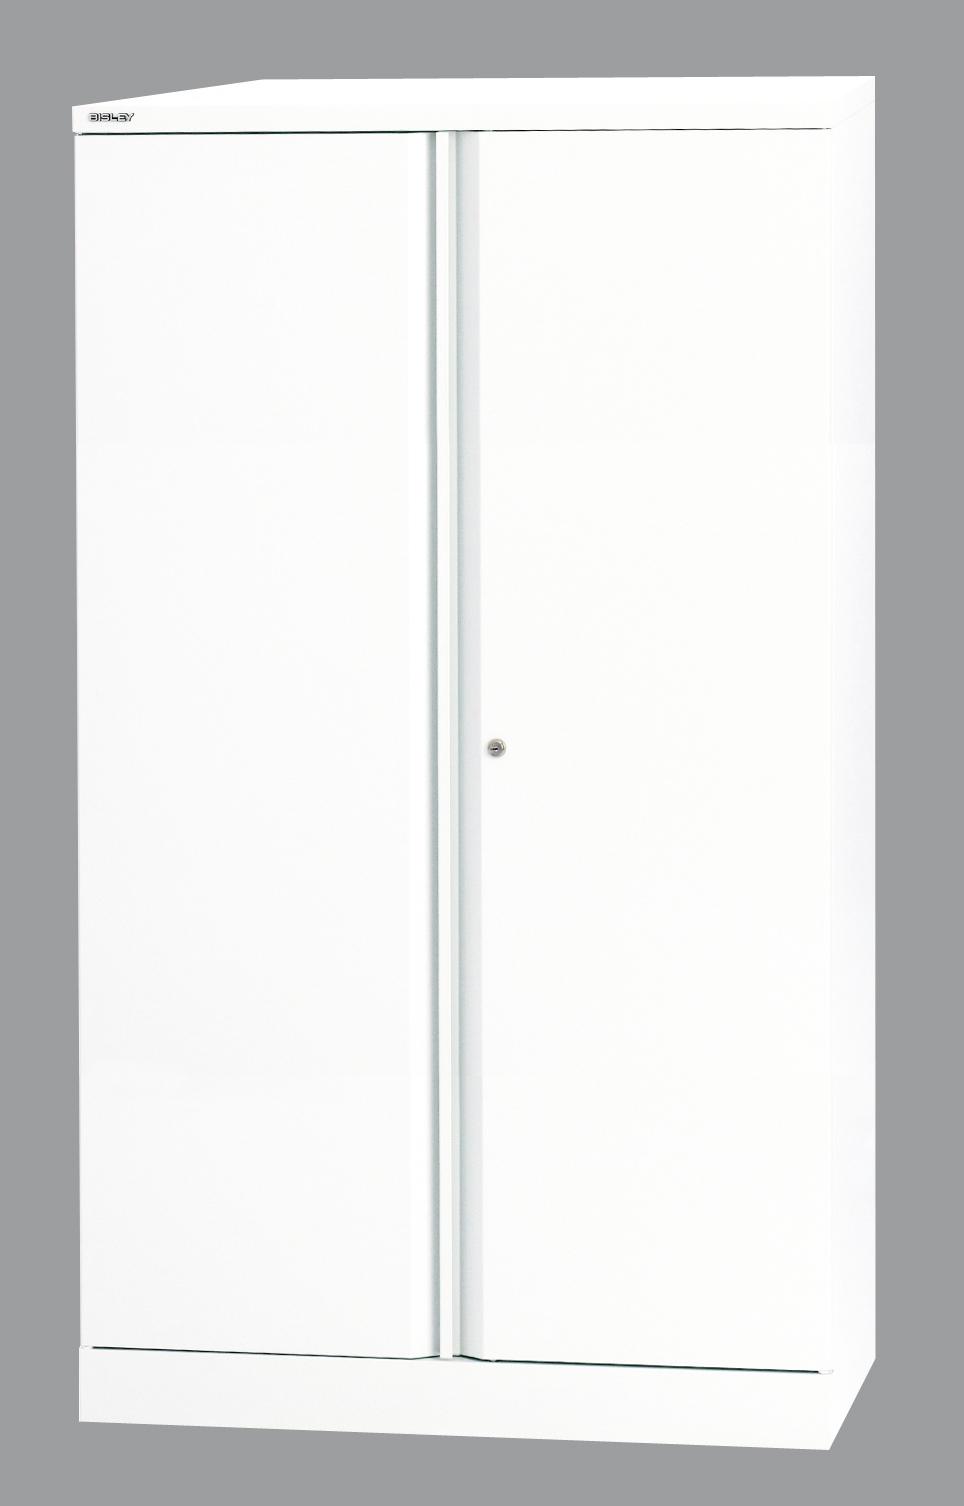 Büroschrank weiß abschließbar  robuster Aktenschrank aus Stahl weiß lackiert mit 2 abschließbaren ...